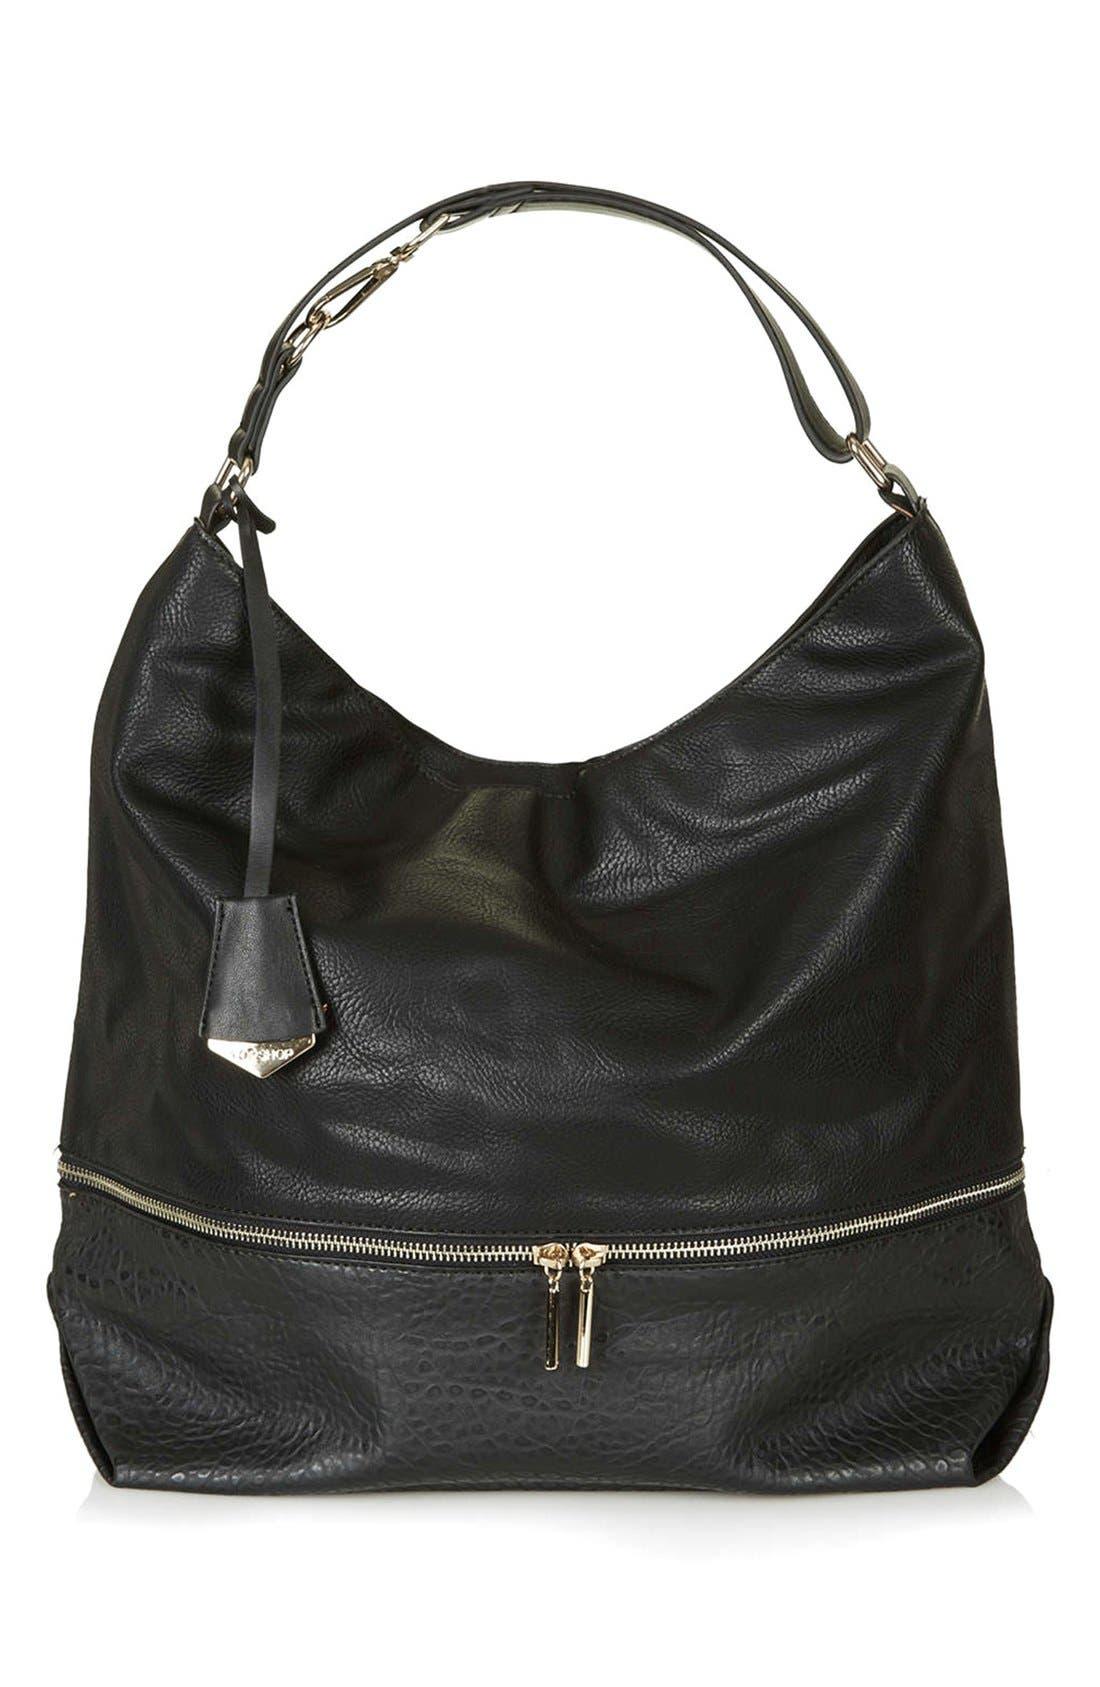 Alternate Image 1 Selected - Topshop Slouchy Hobo Bag